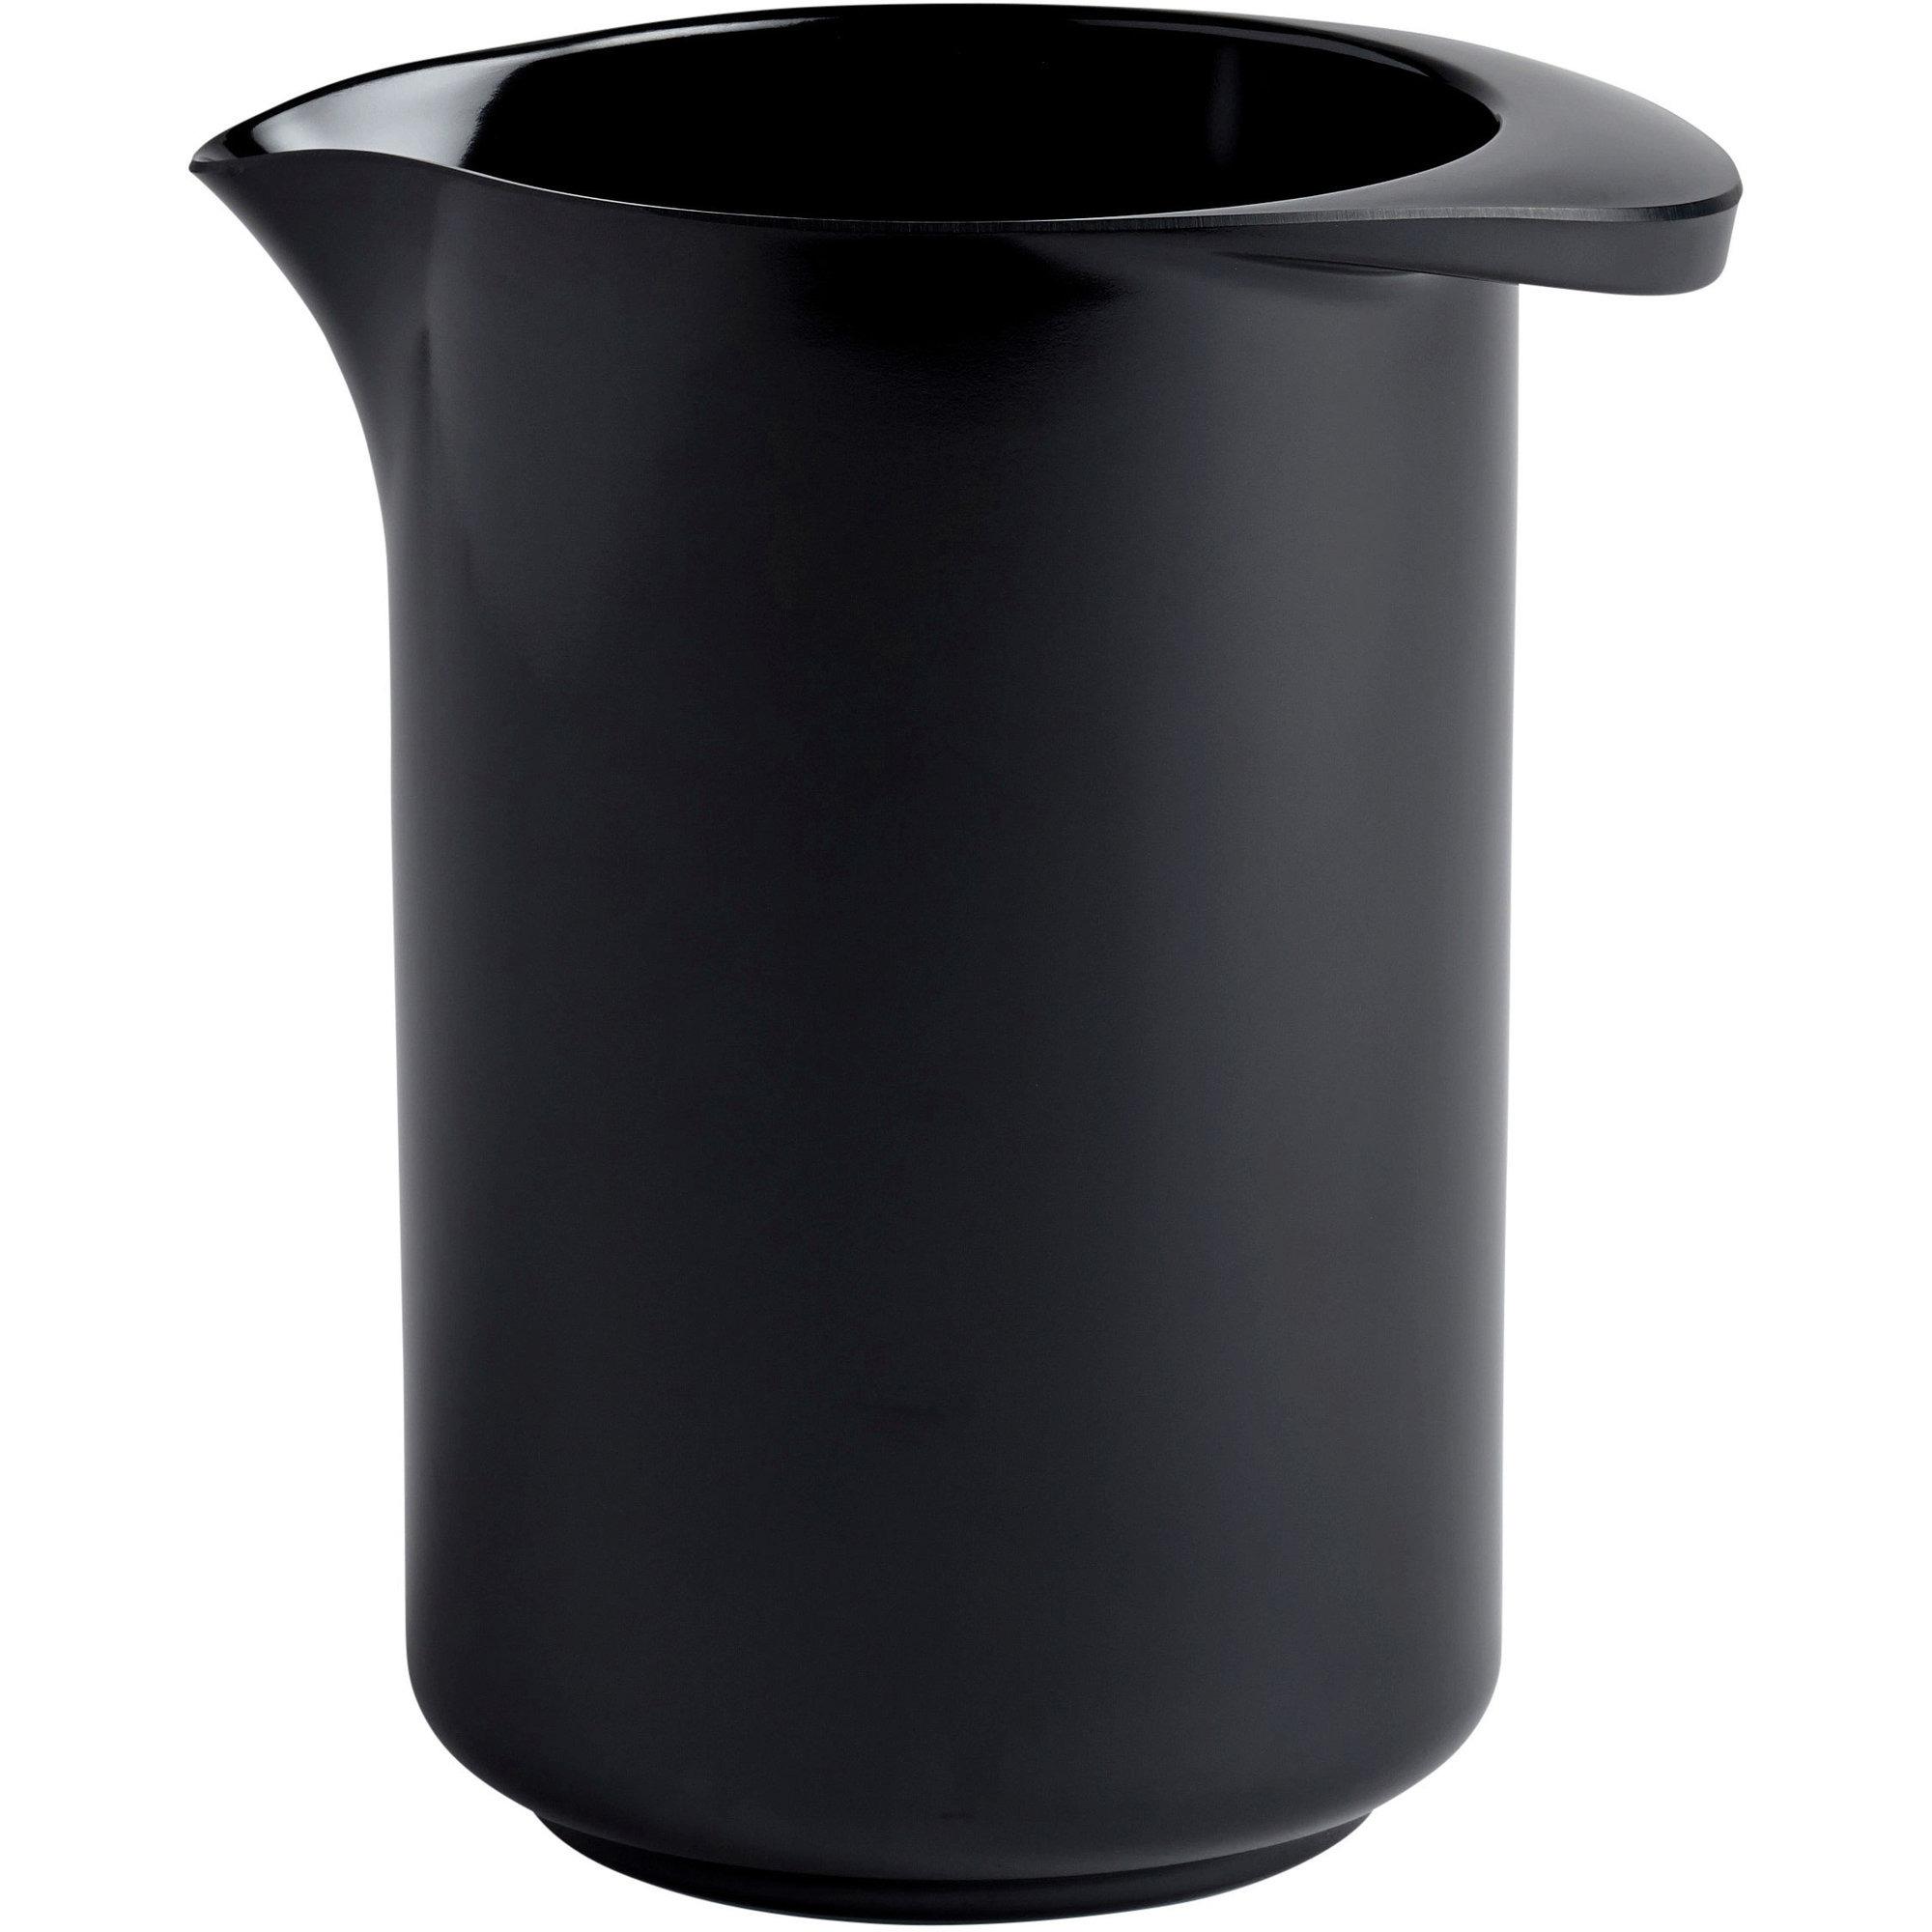 Rosti Mepal mixkanna 05 liter (Svart)